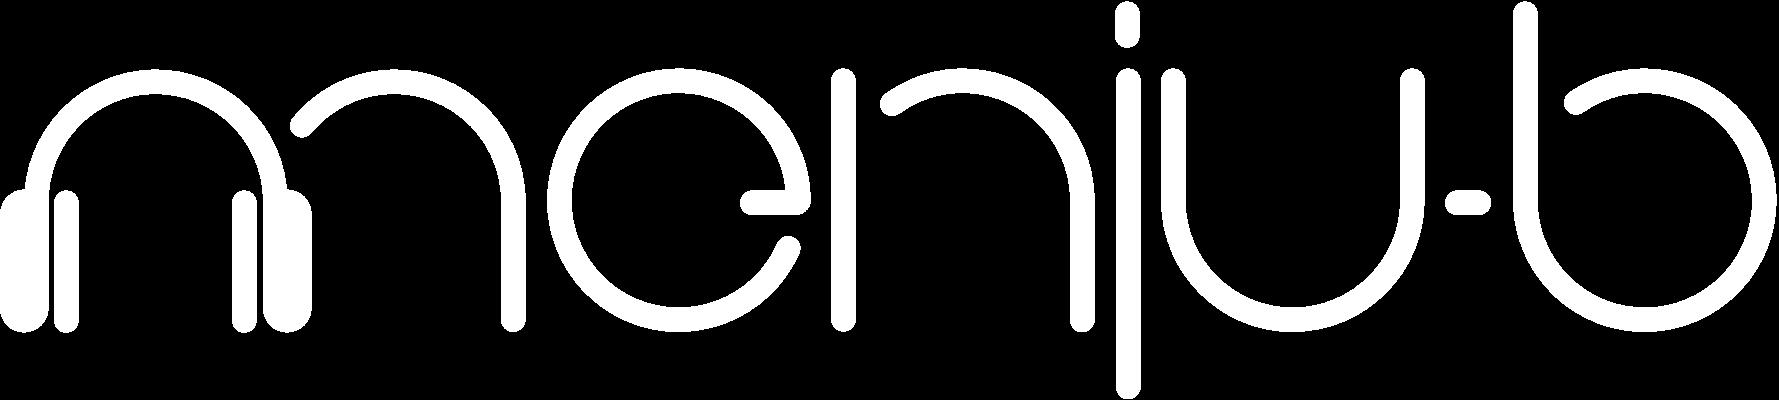 menju-b